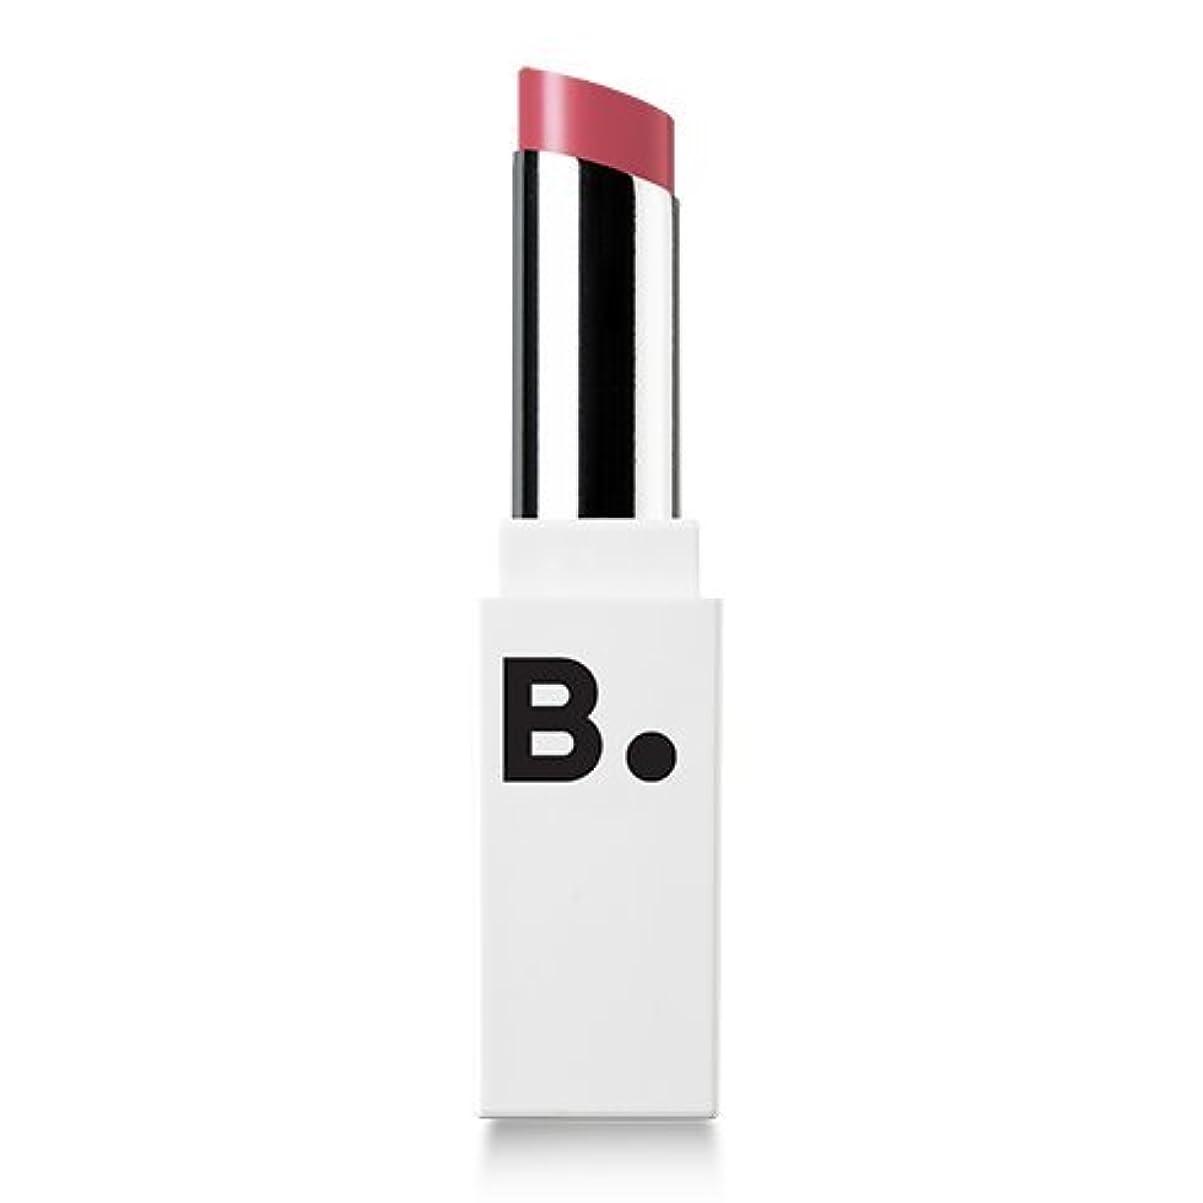 BANILA CO Lip Draw Melting Serum Stick 4.2g/バニラコ リップ ドロー メルティング セラム スティック 4.2g (#SPK03 Rose Falling) [並行輸入品]